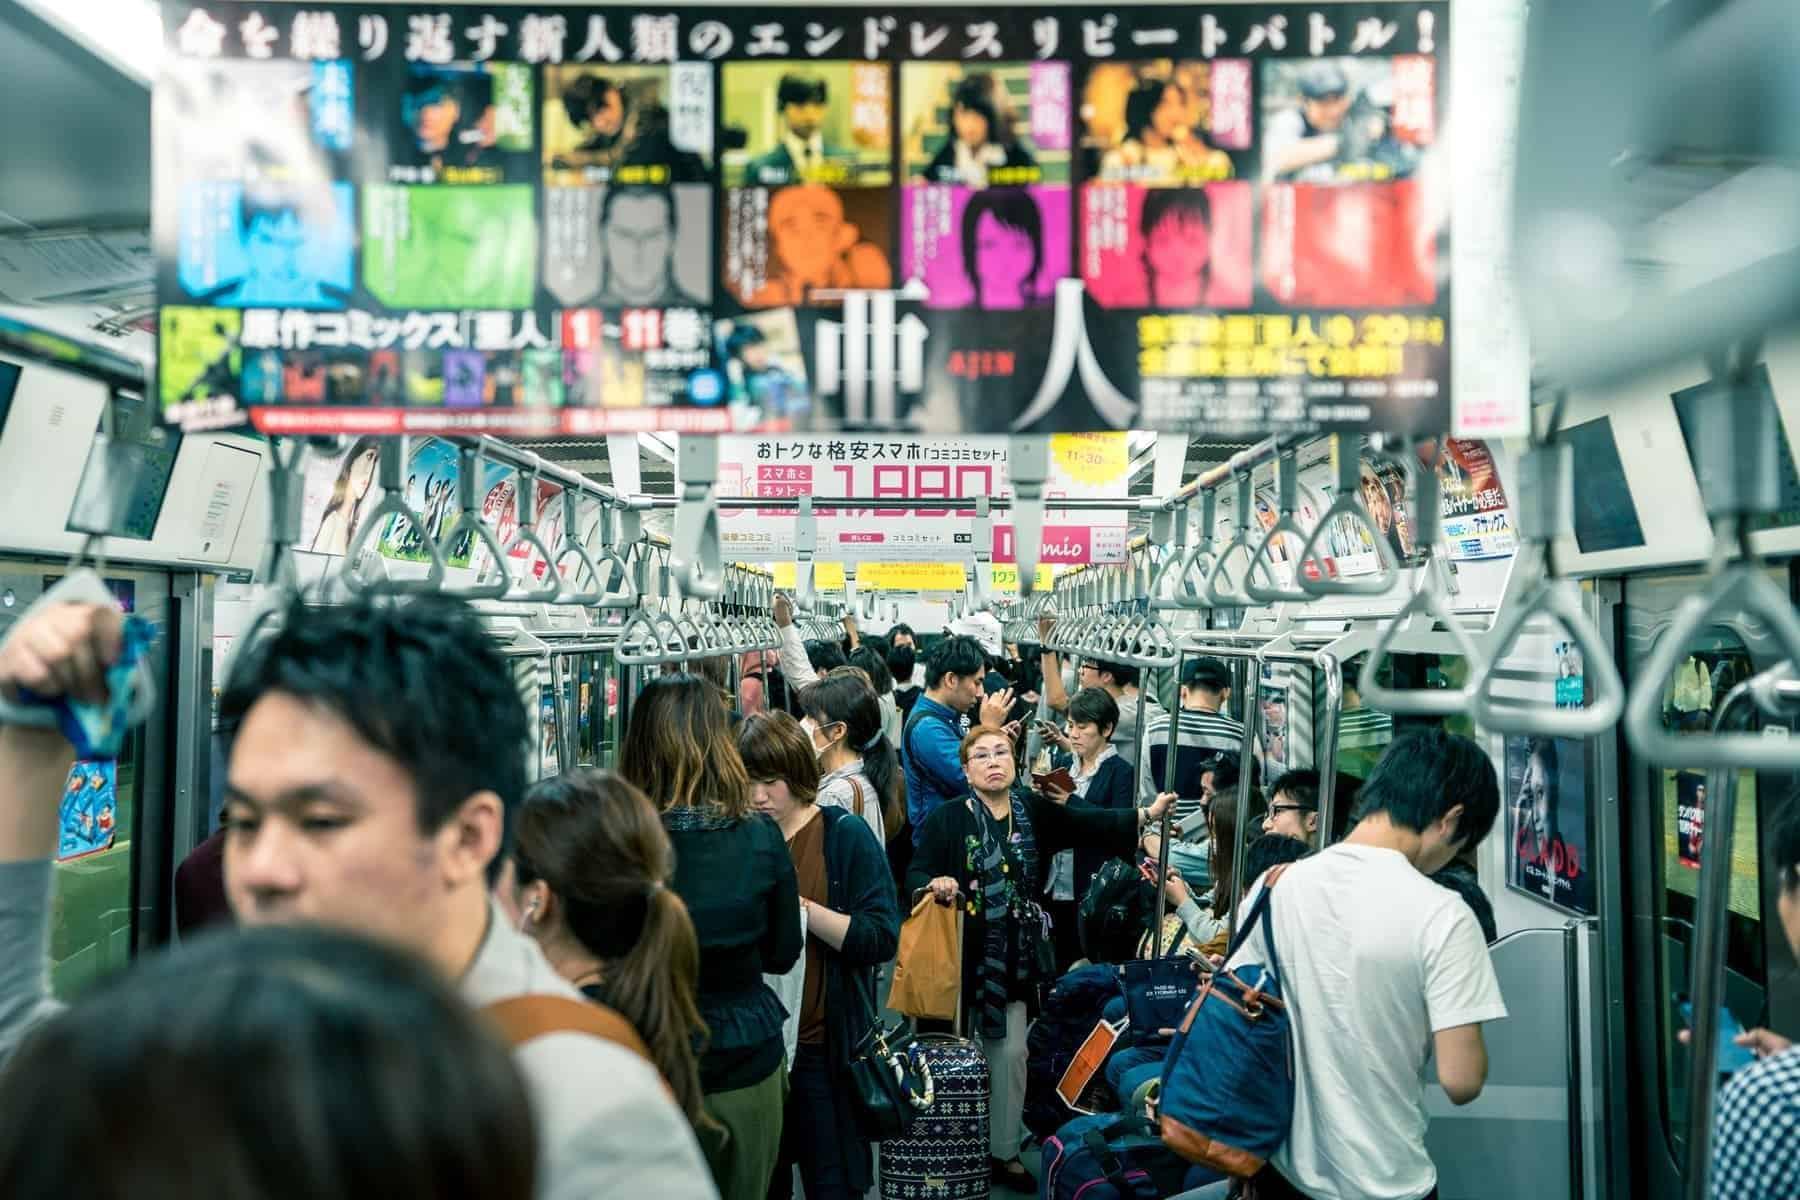 Tokyo, Japan, October 2017: People in the metro train subway in Tokyo City, Japan